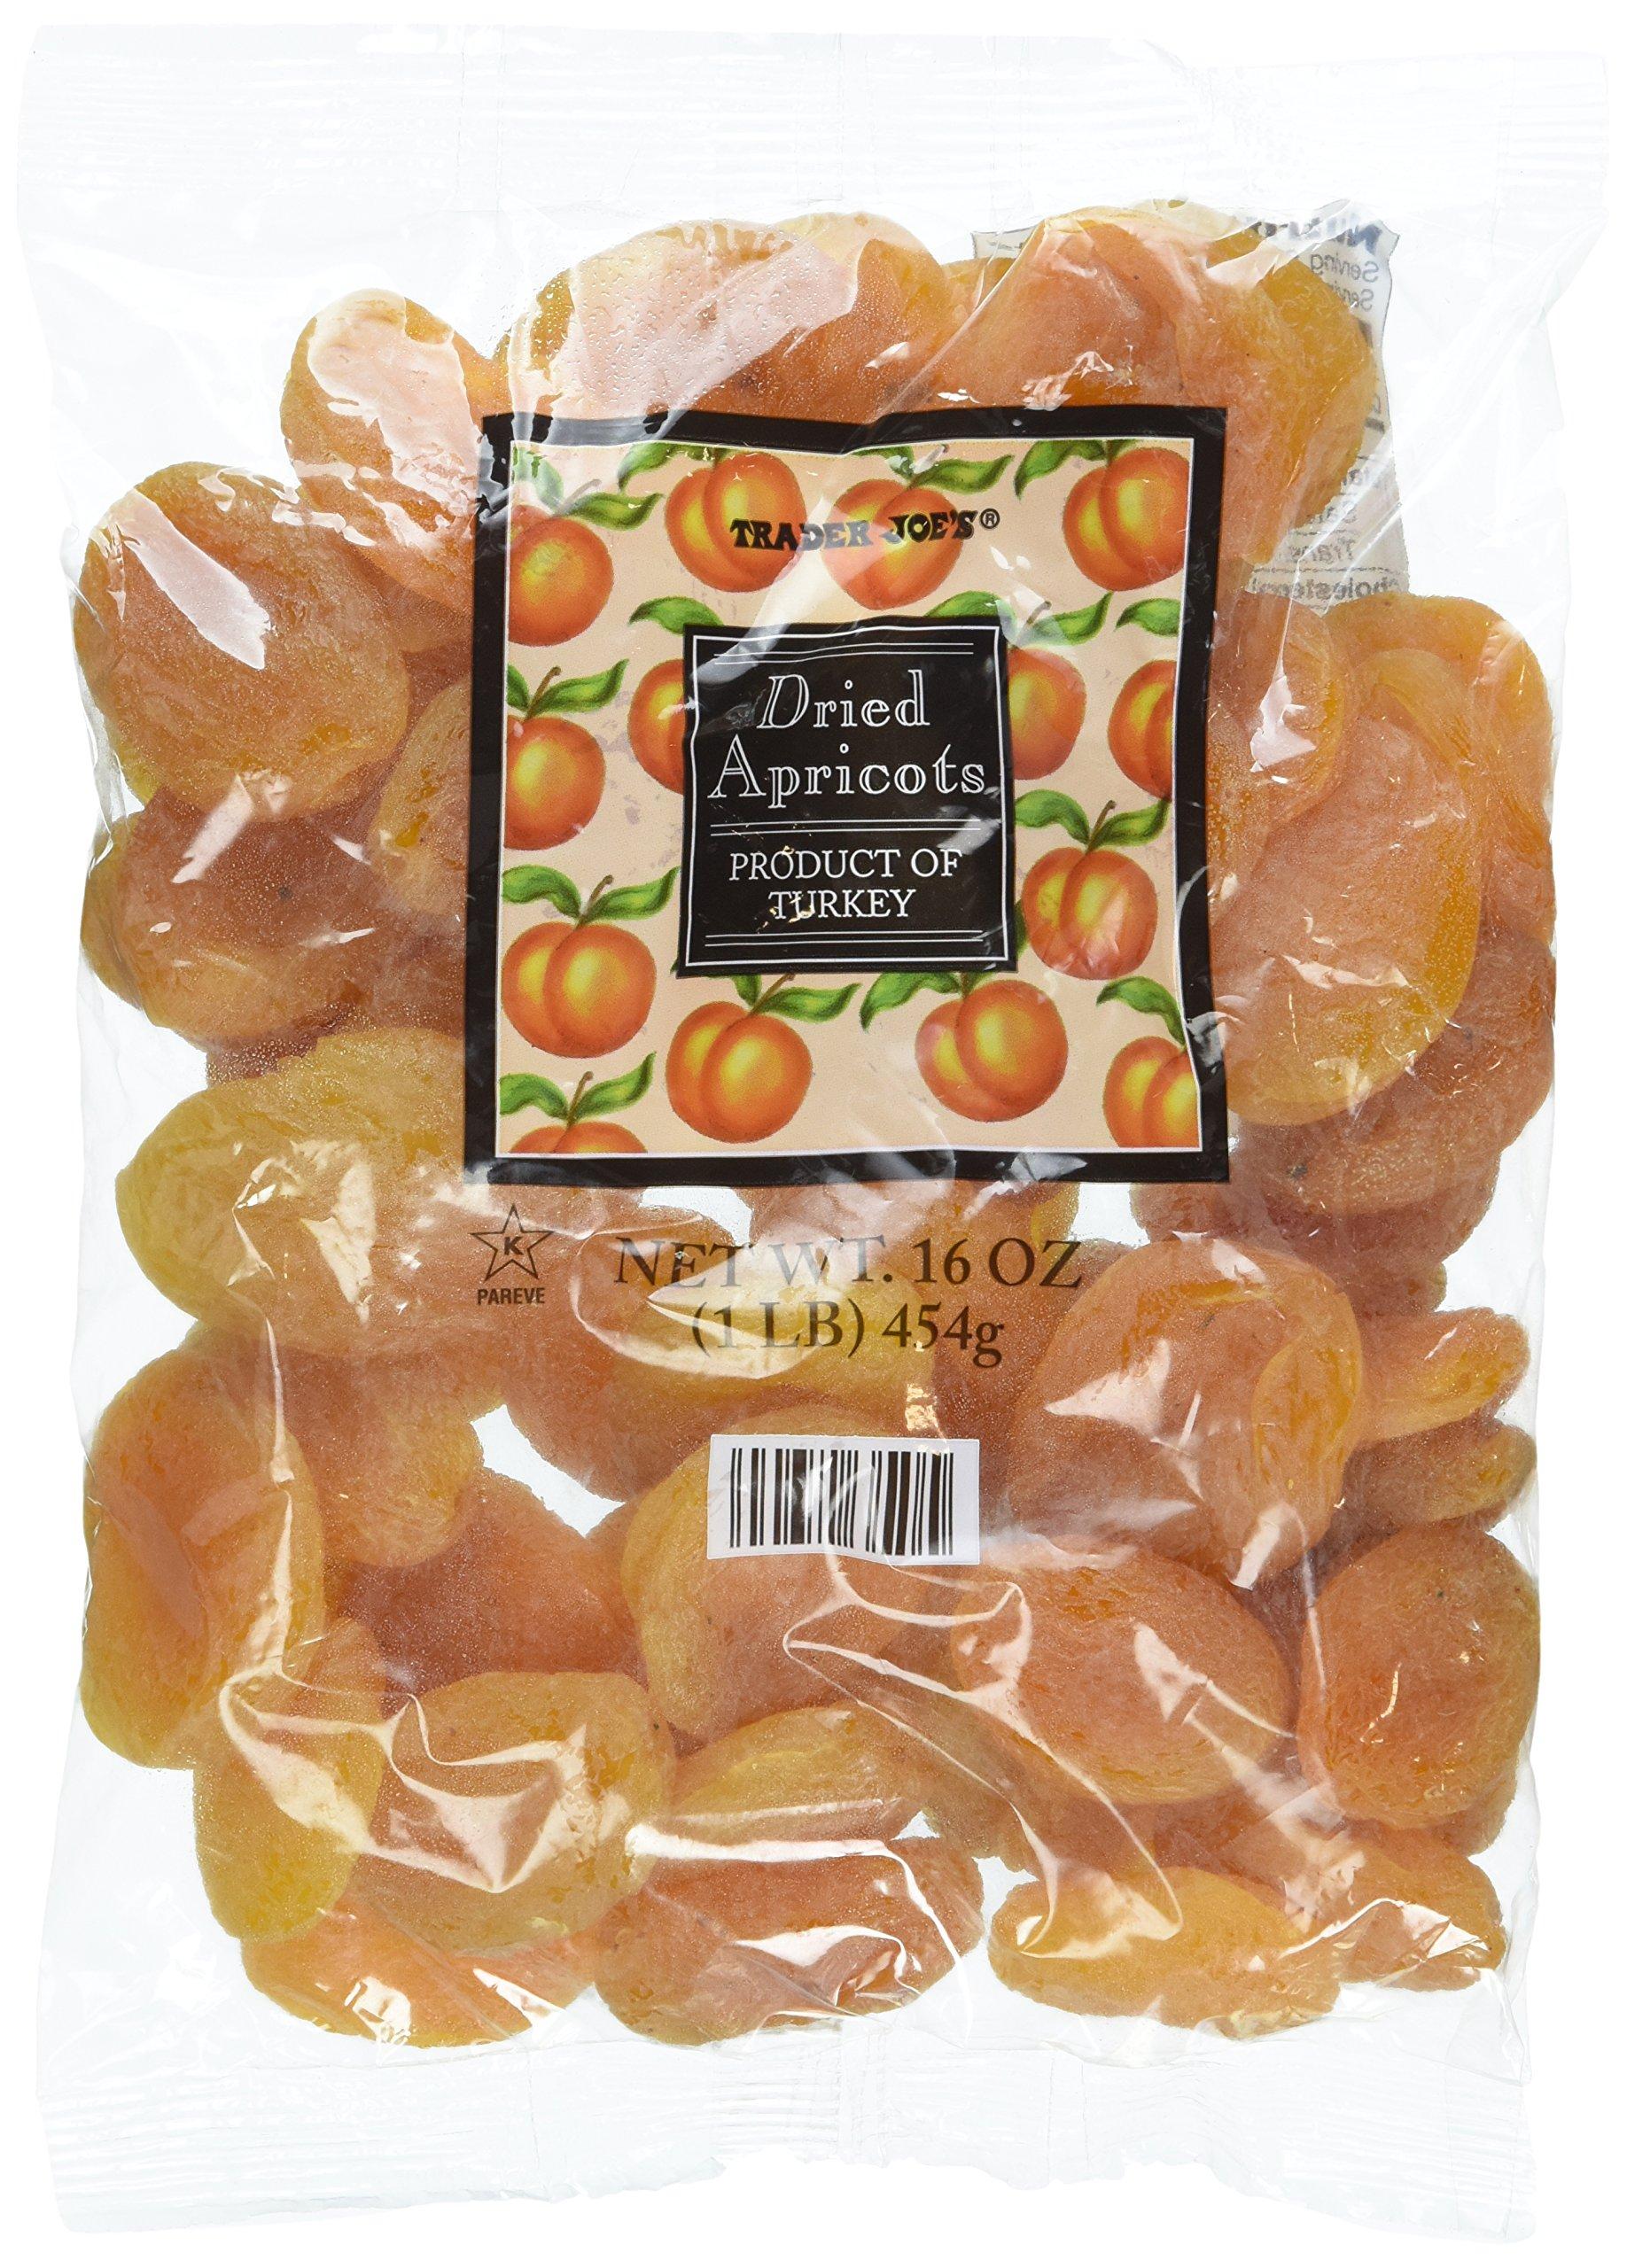 Trader Joe's Dried Apricots 1lb